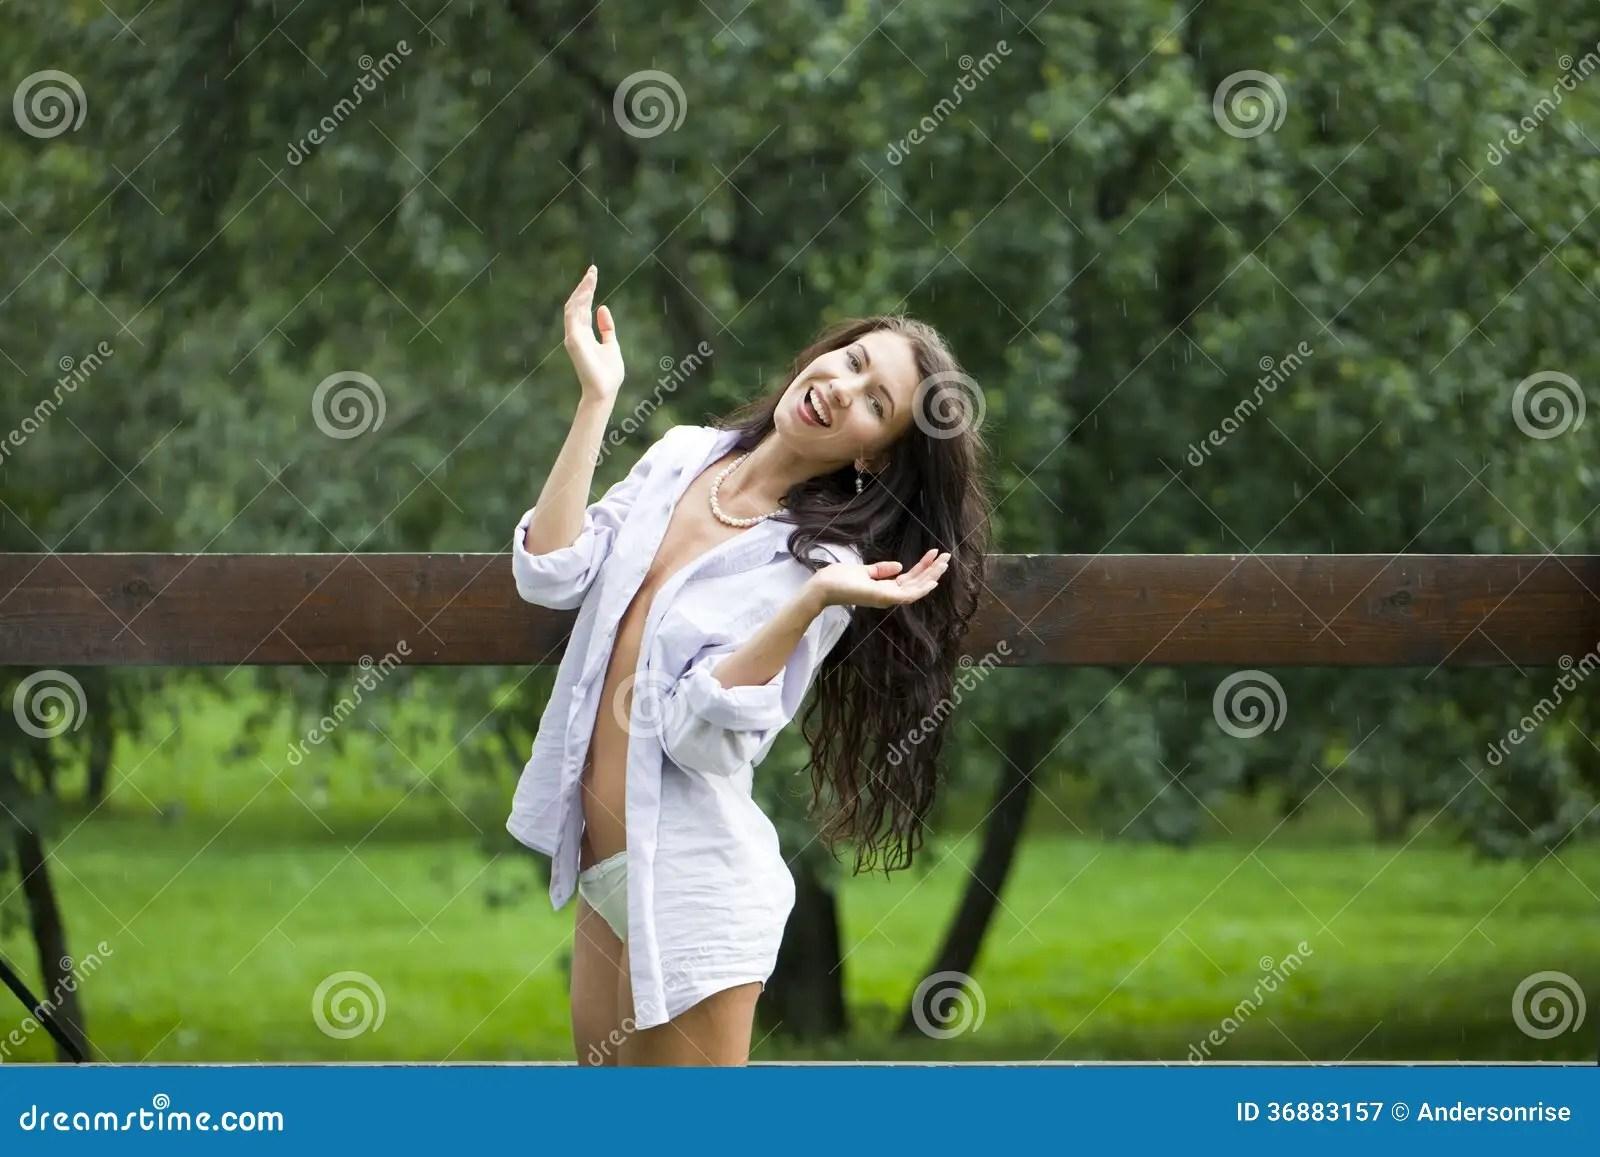 Attitude Girl Wallpaper Hd Download Happy Woman Walking In The Rain Stock Image Image 36883157